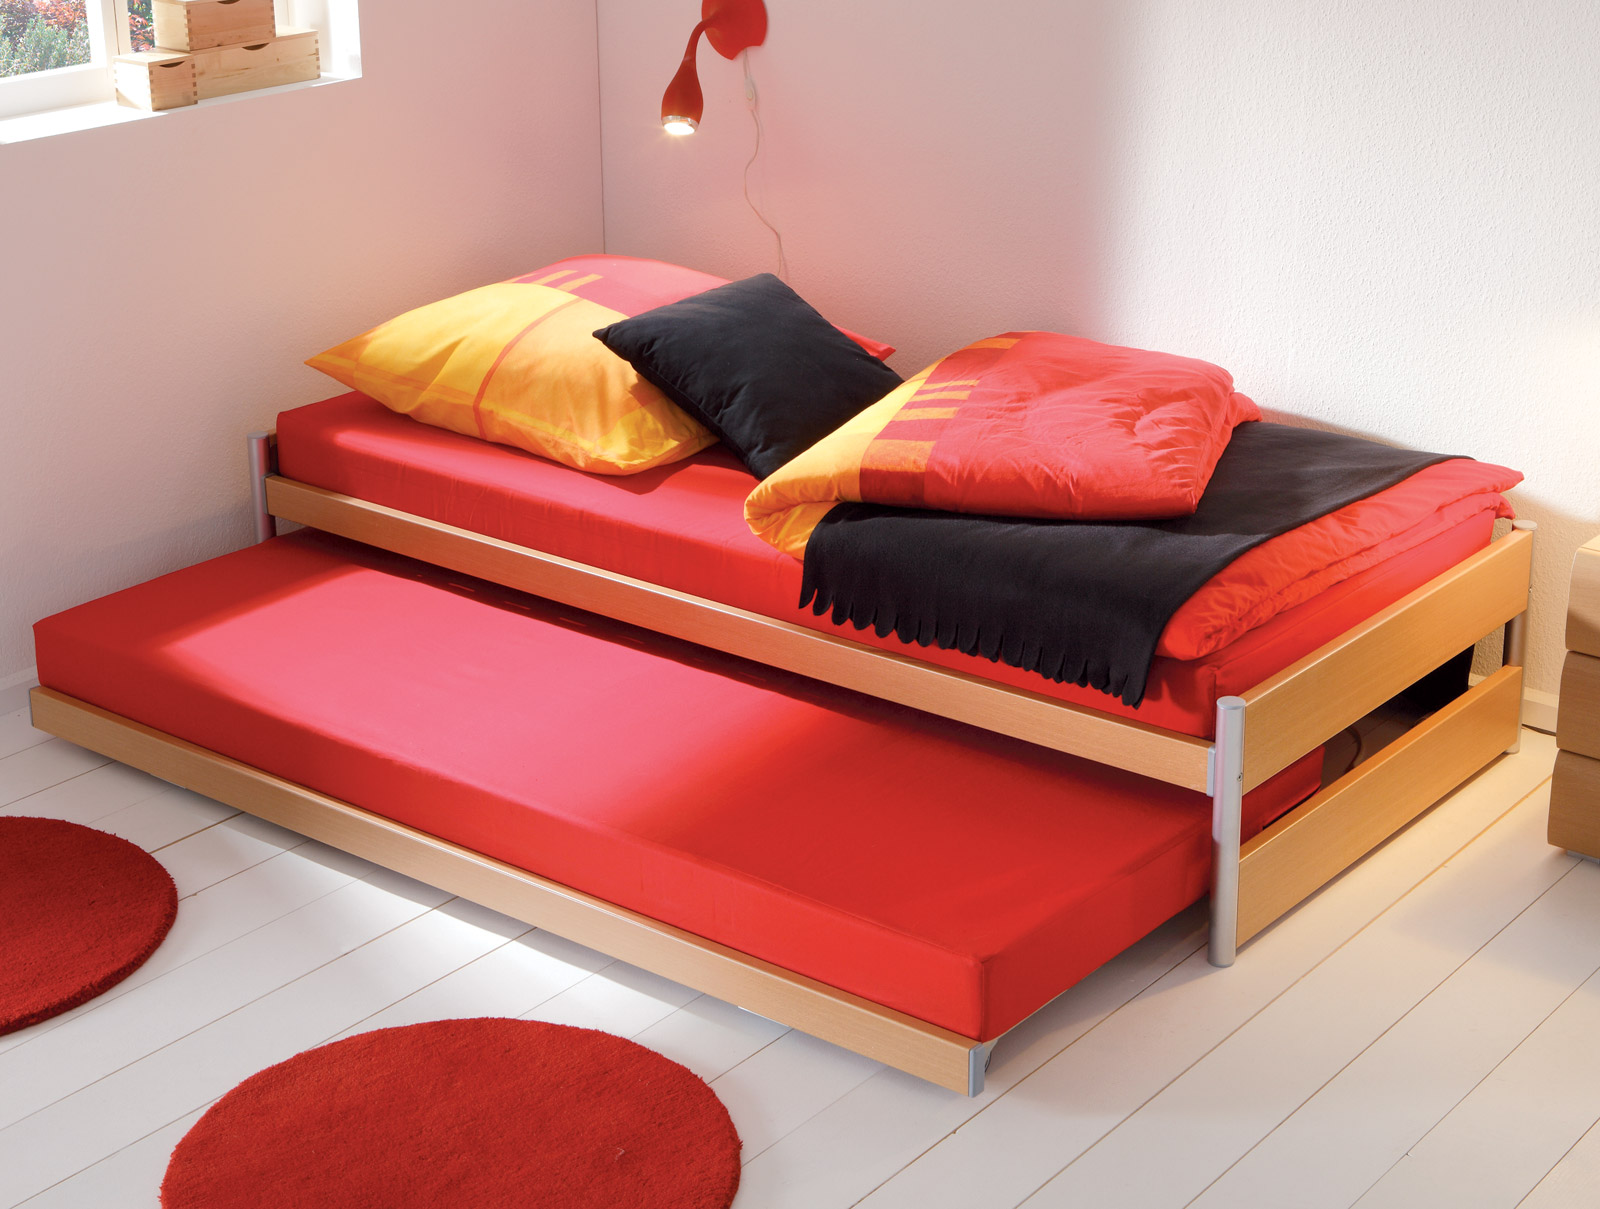 Full Size of Gnstiges Ausziehbett Mit Zwei Liegeflchen Louis Bettende Bett Betten.de